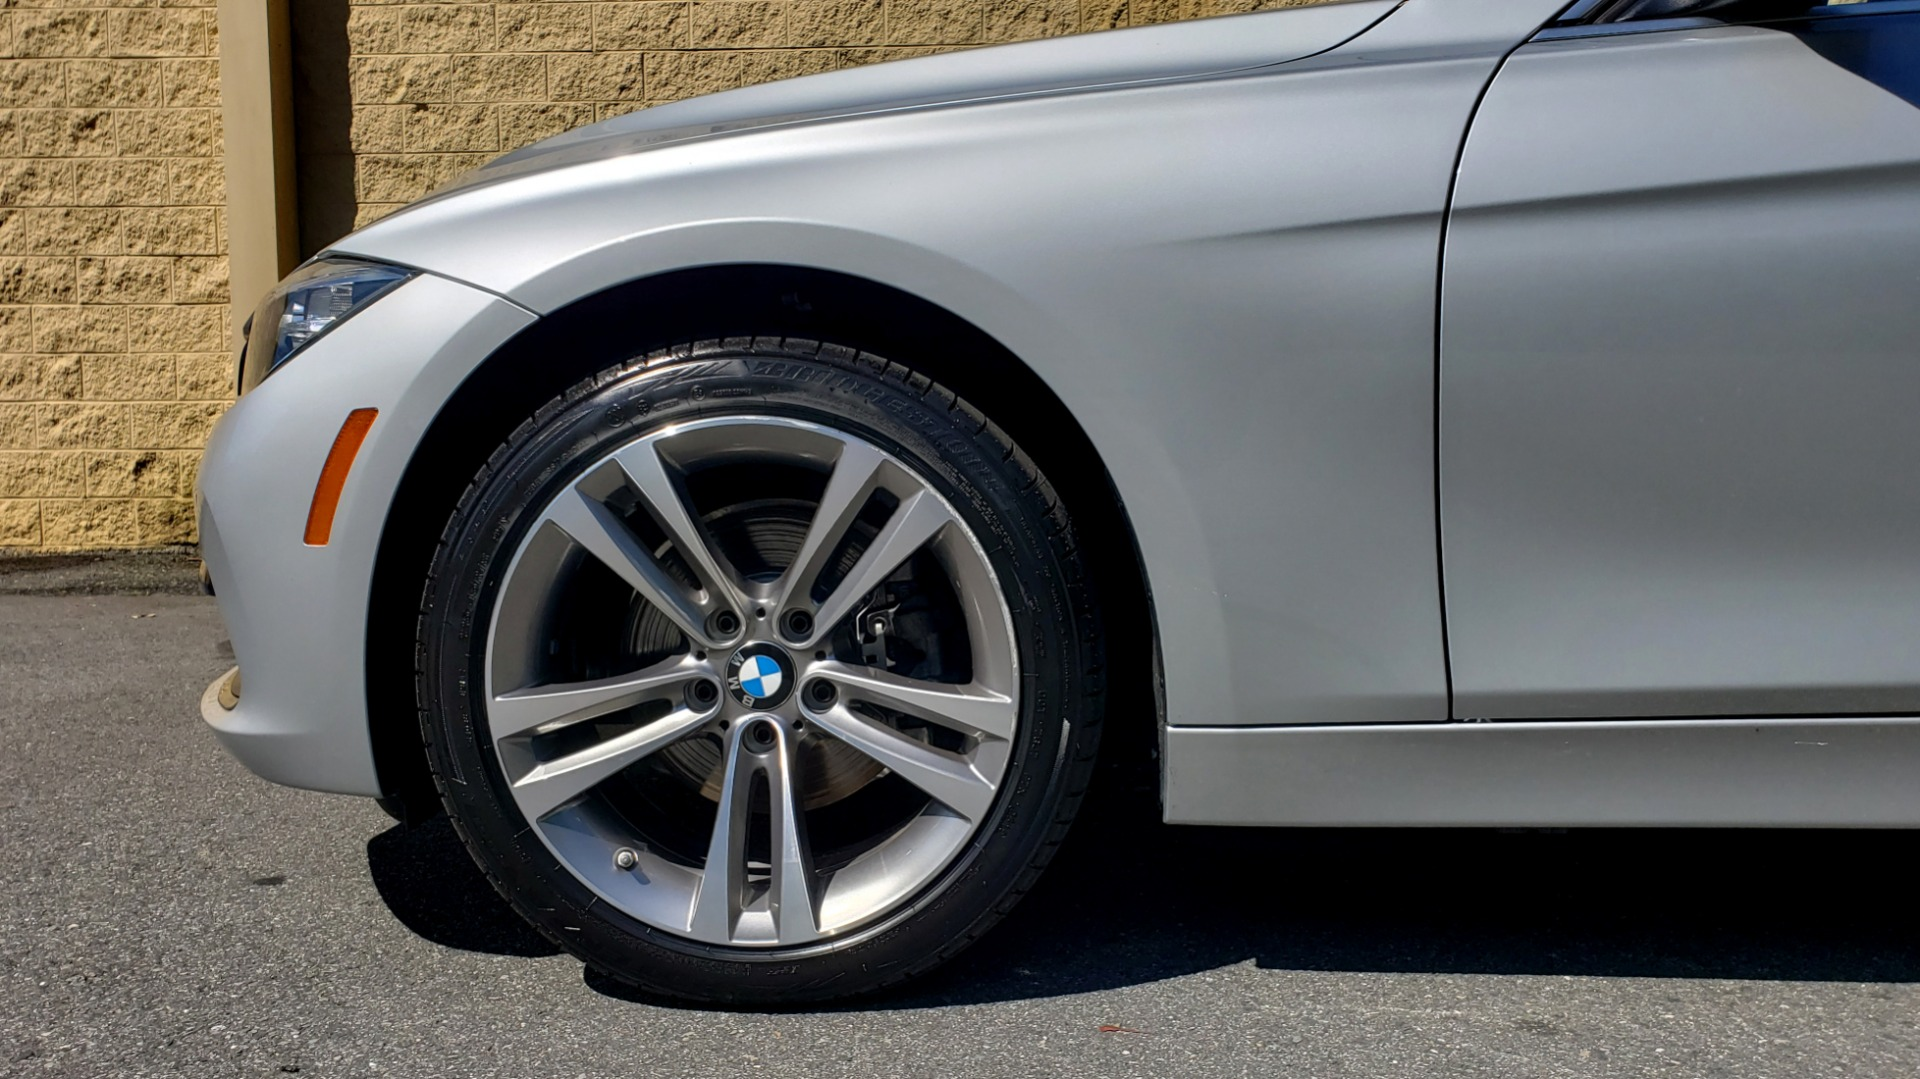 Used 2017 BMW 3 SERIES 330I SPORT SEDAN / DRVR ASST PKG / SUNROOF / REARVIEW for sale Sold at Formula Imports in Charlotte NC 28227 76